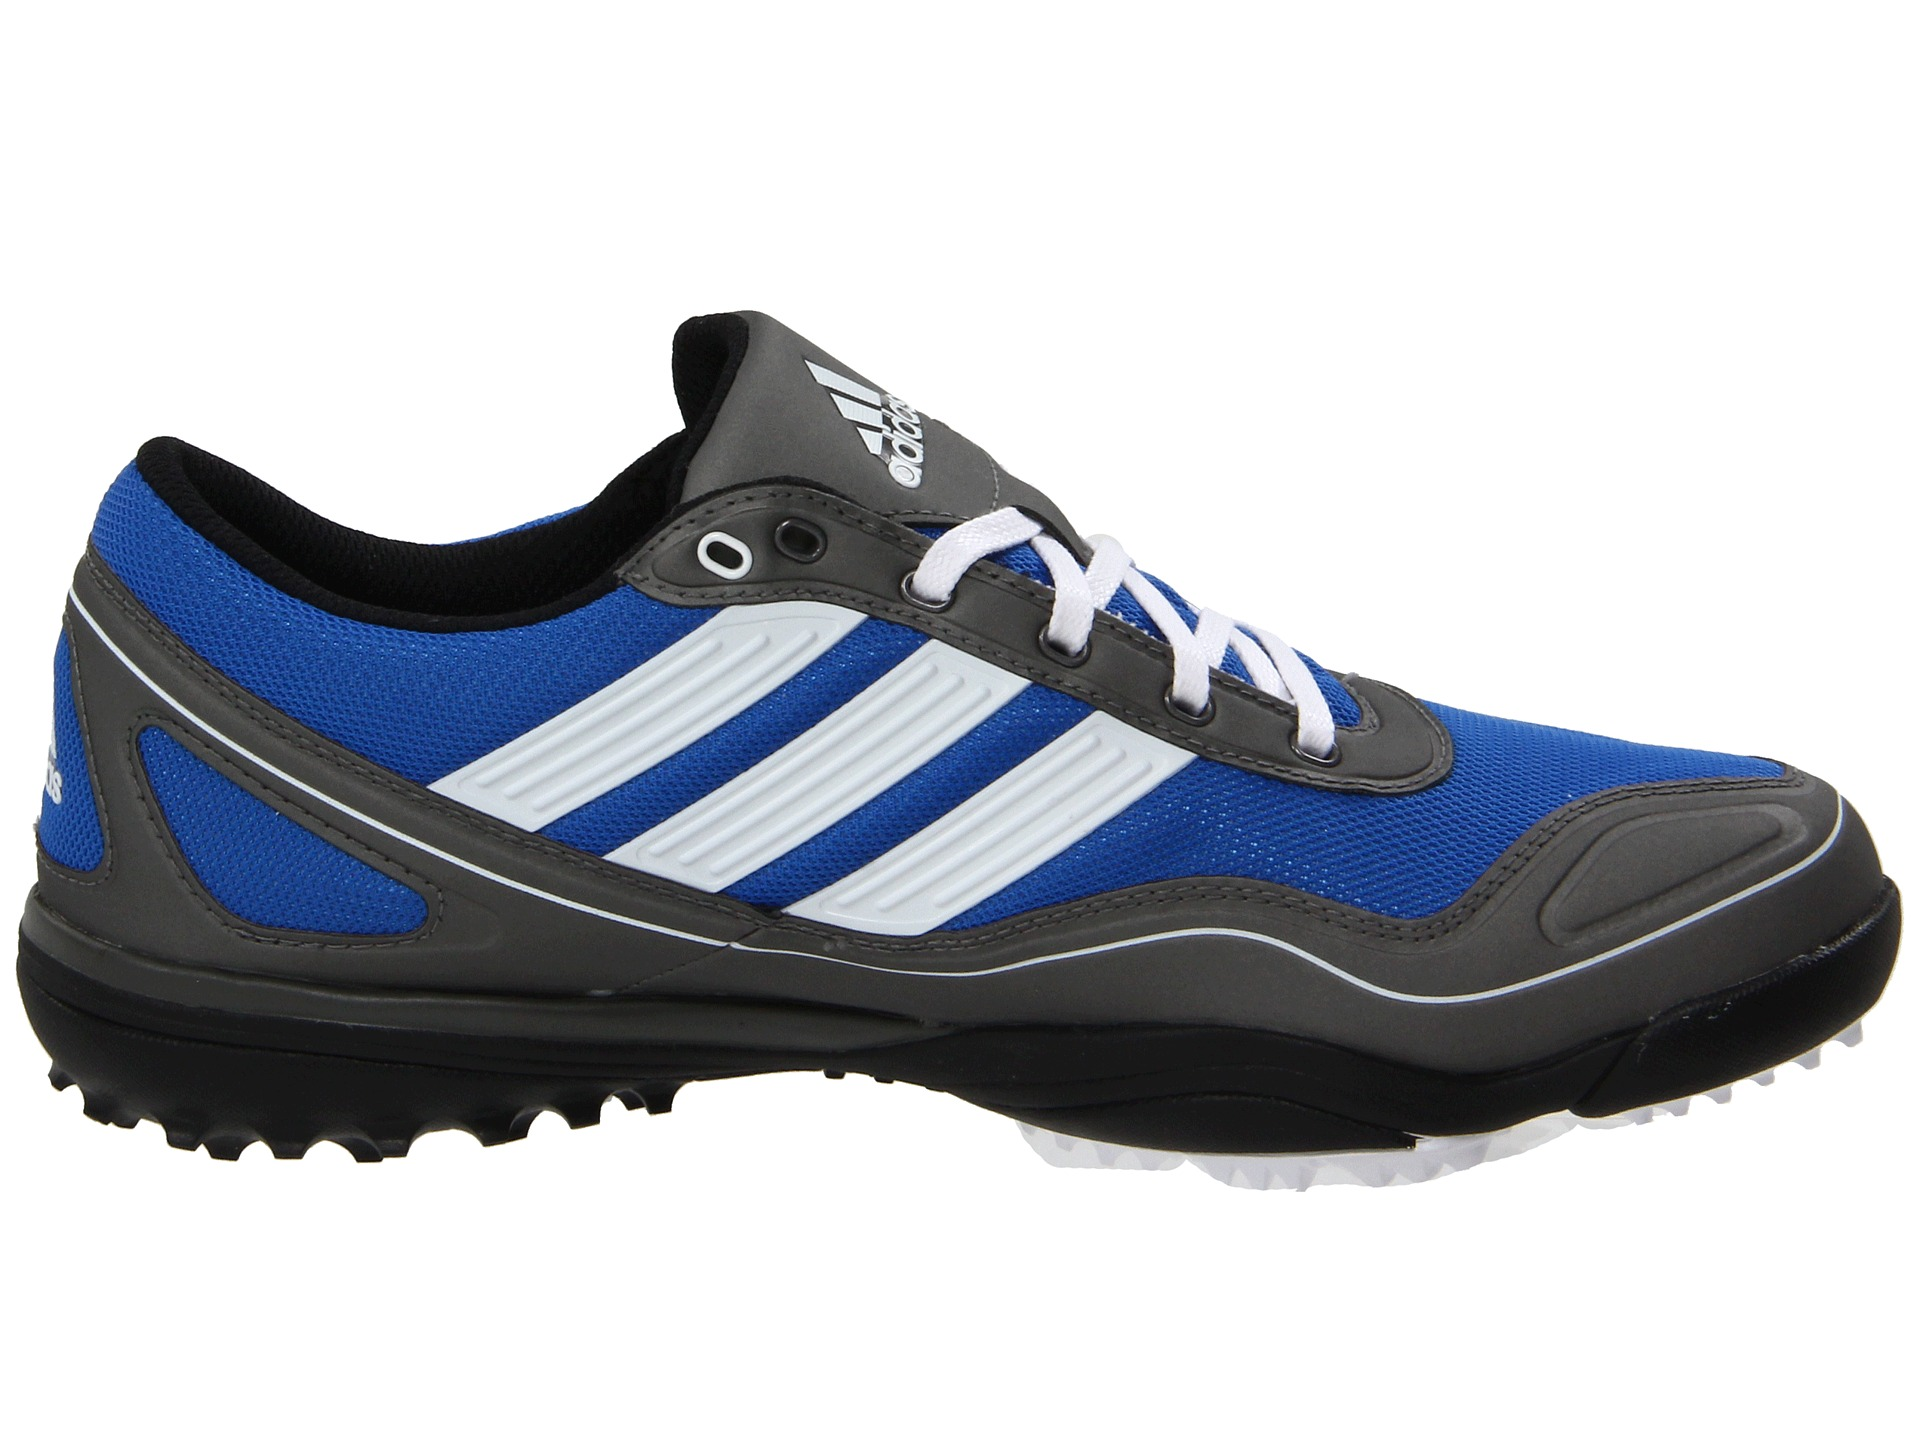 c1ac4a1642b14 Buy Adidas Iniki Runner Boost Sale Floral Adida Shoes